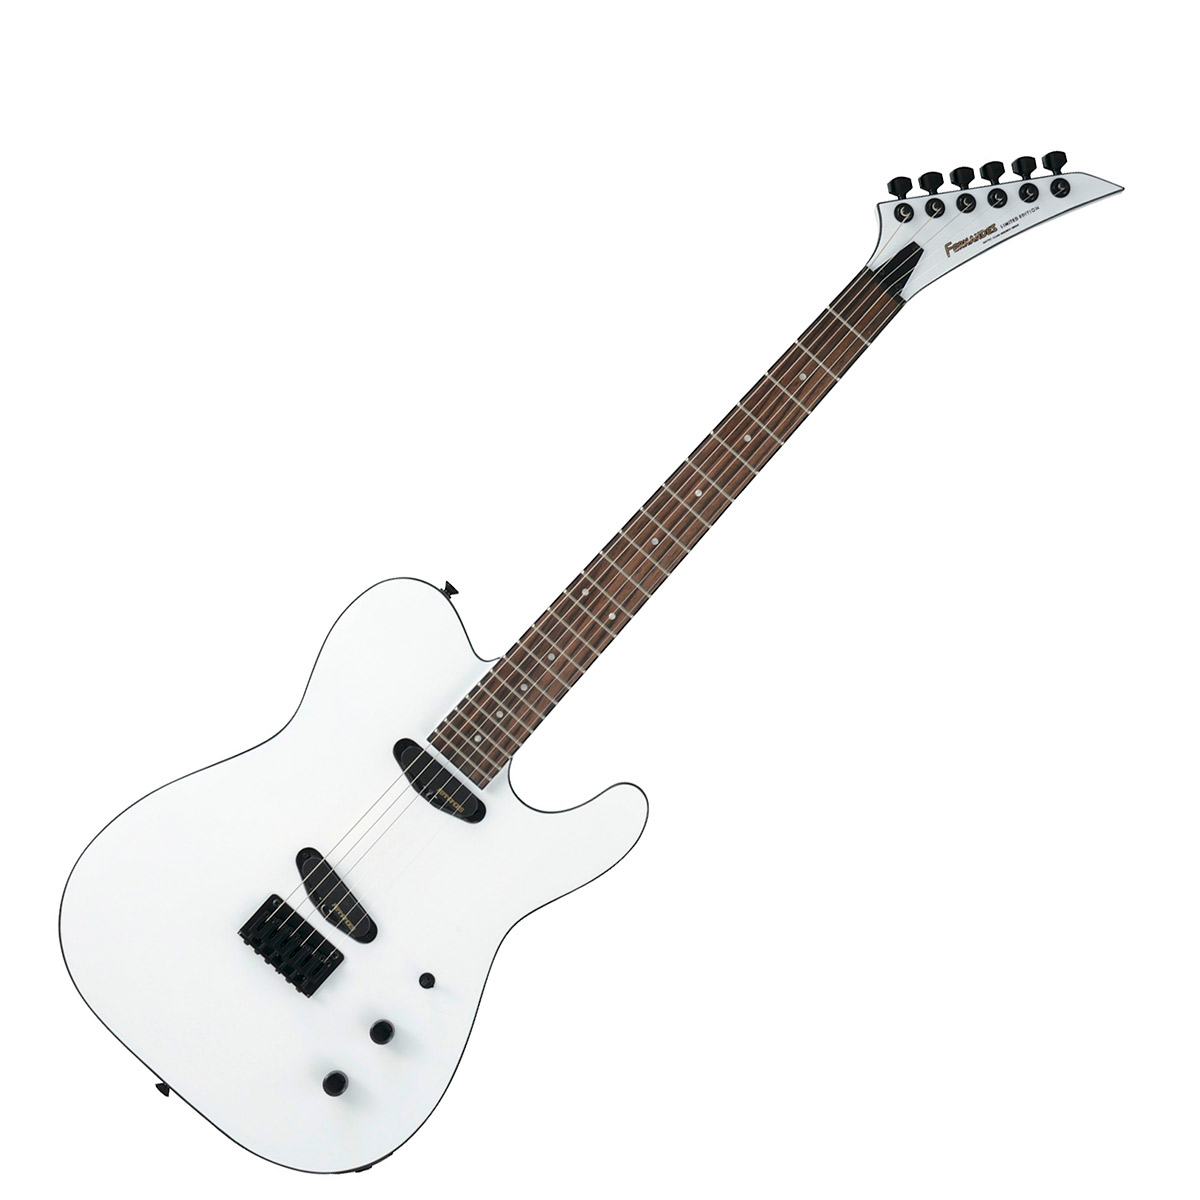 FERNANDES TEJ-STD 2S 2019 SW スノーホワイト エレキギター TEJシリーズ 【フェルナンデス】